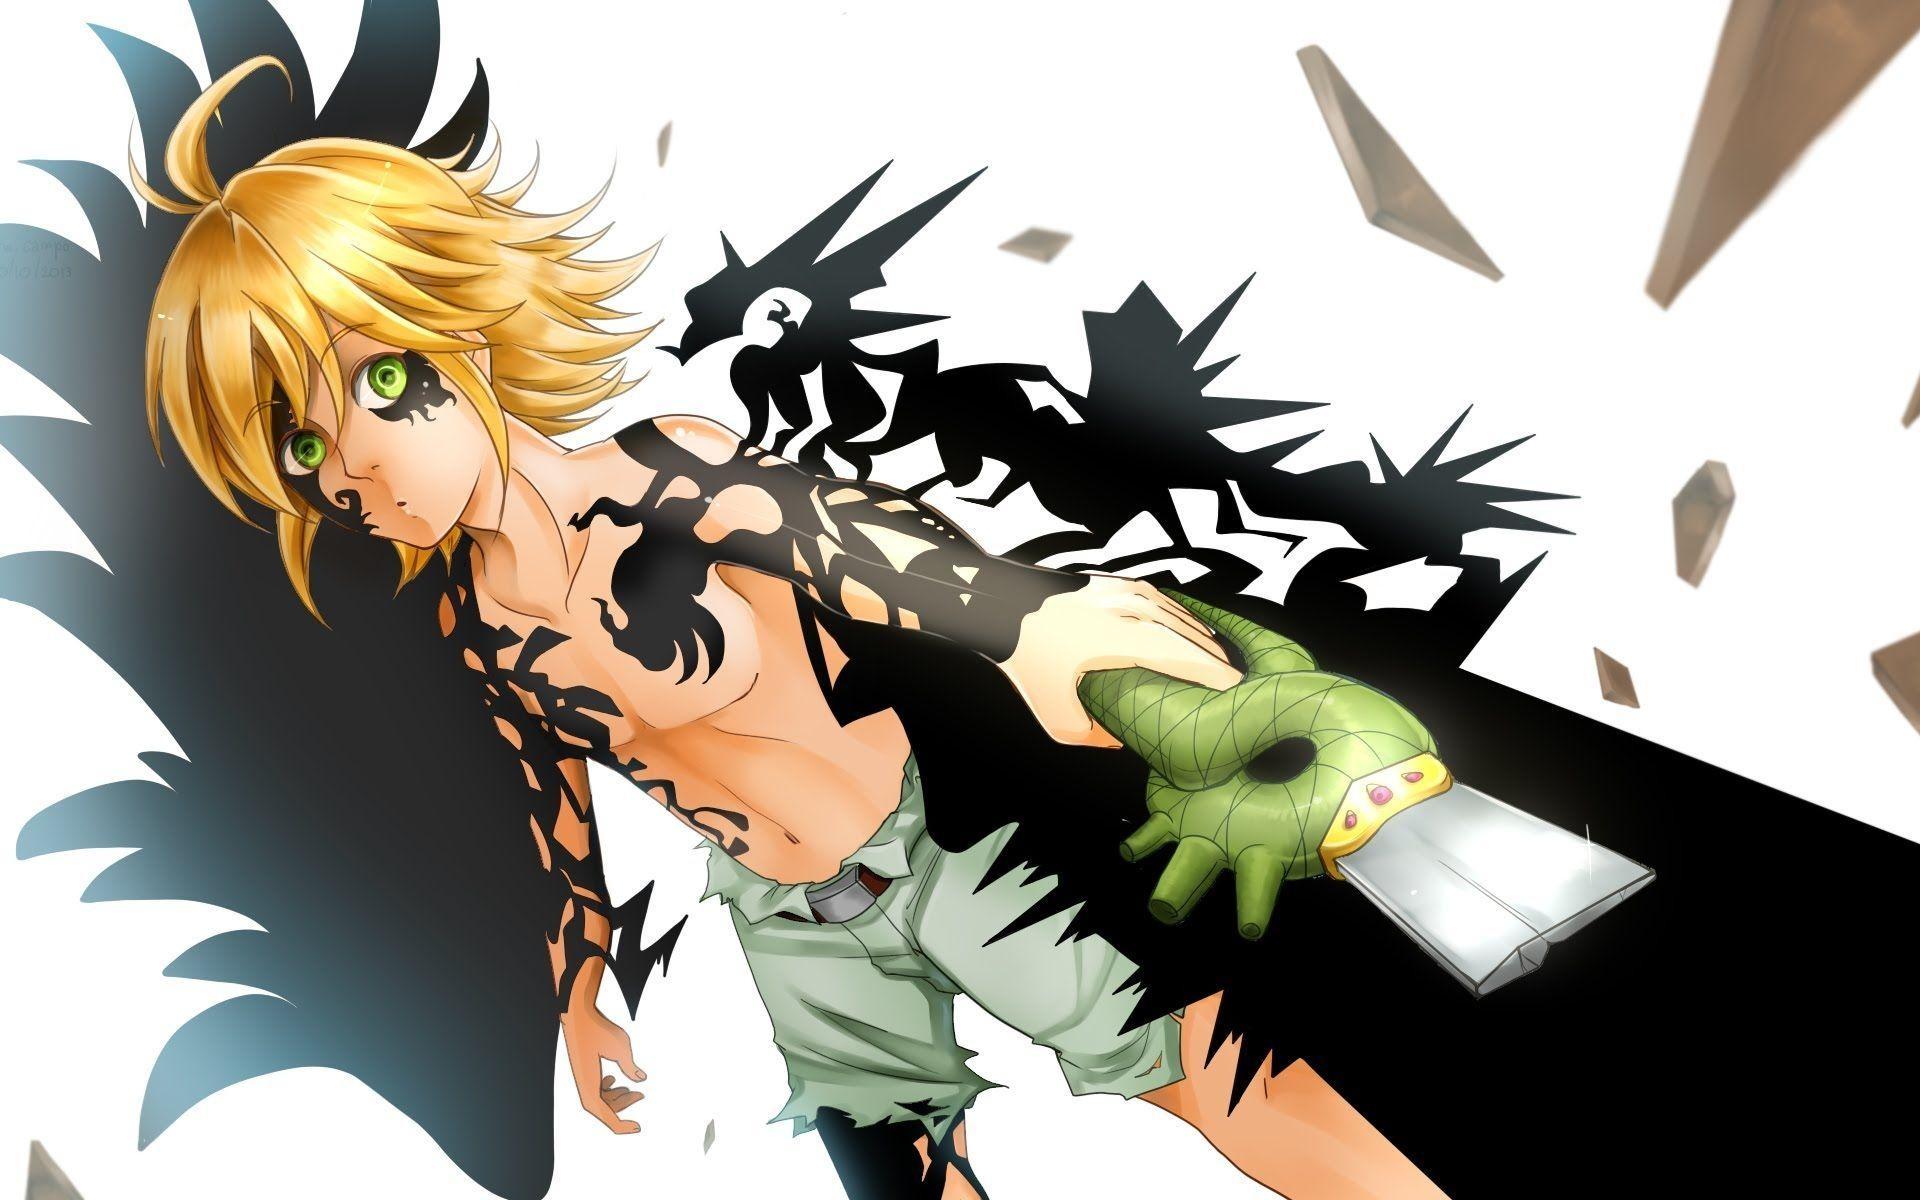 Nanatsu no taizai – The Seven Deadly Sins Wallpaper (.